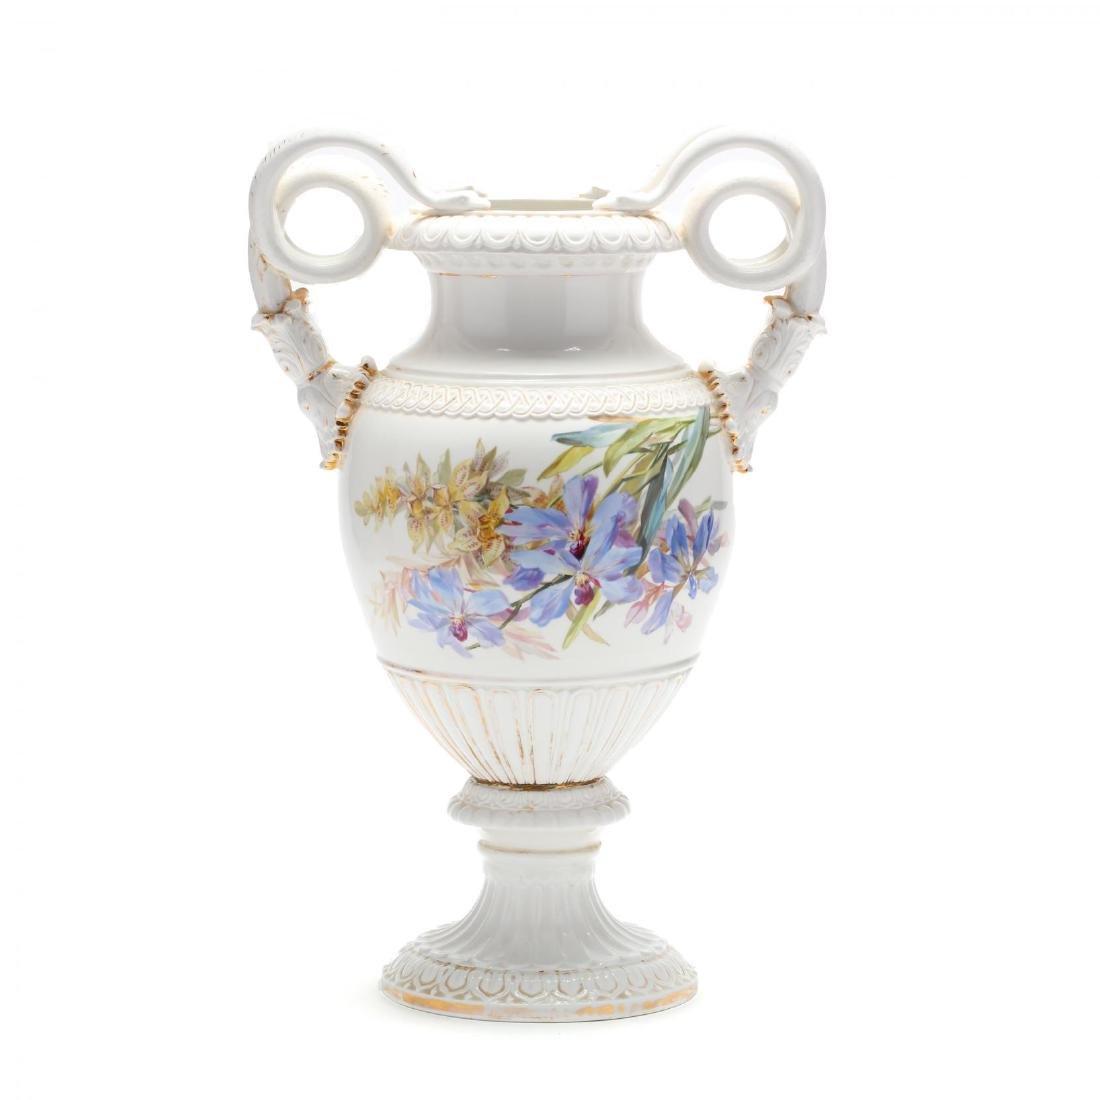 A Meissen Gilt Decorated Porcelain Vase